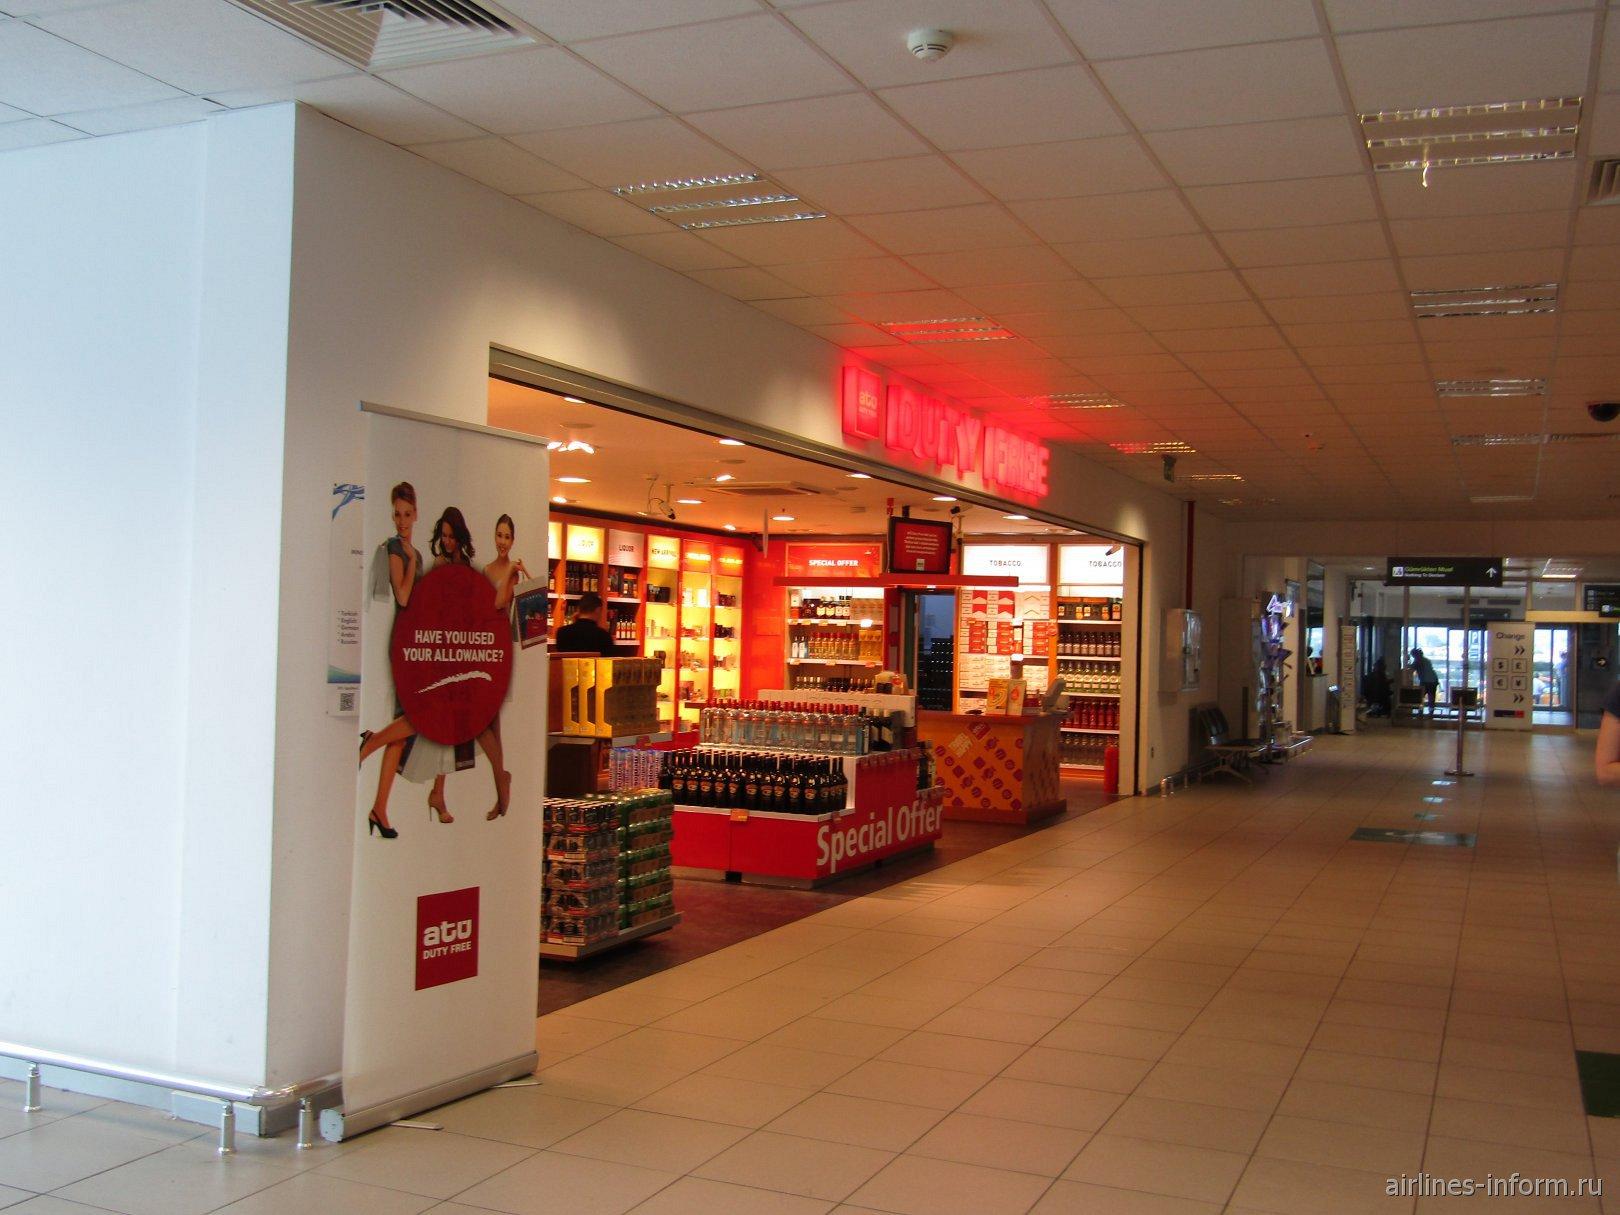 Магазин Duty Free в аэропорту Алания Газипаша